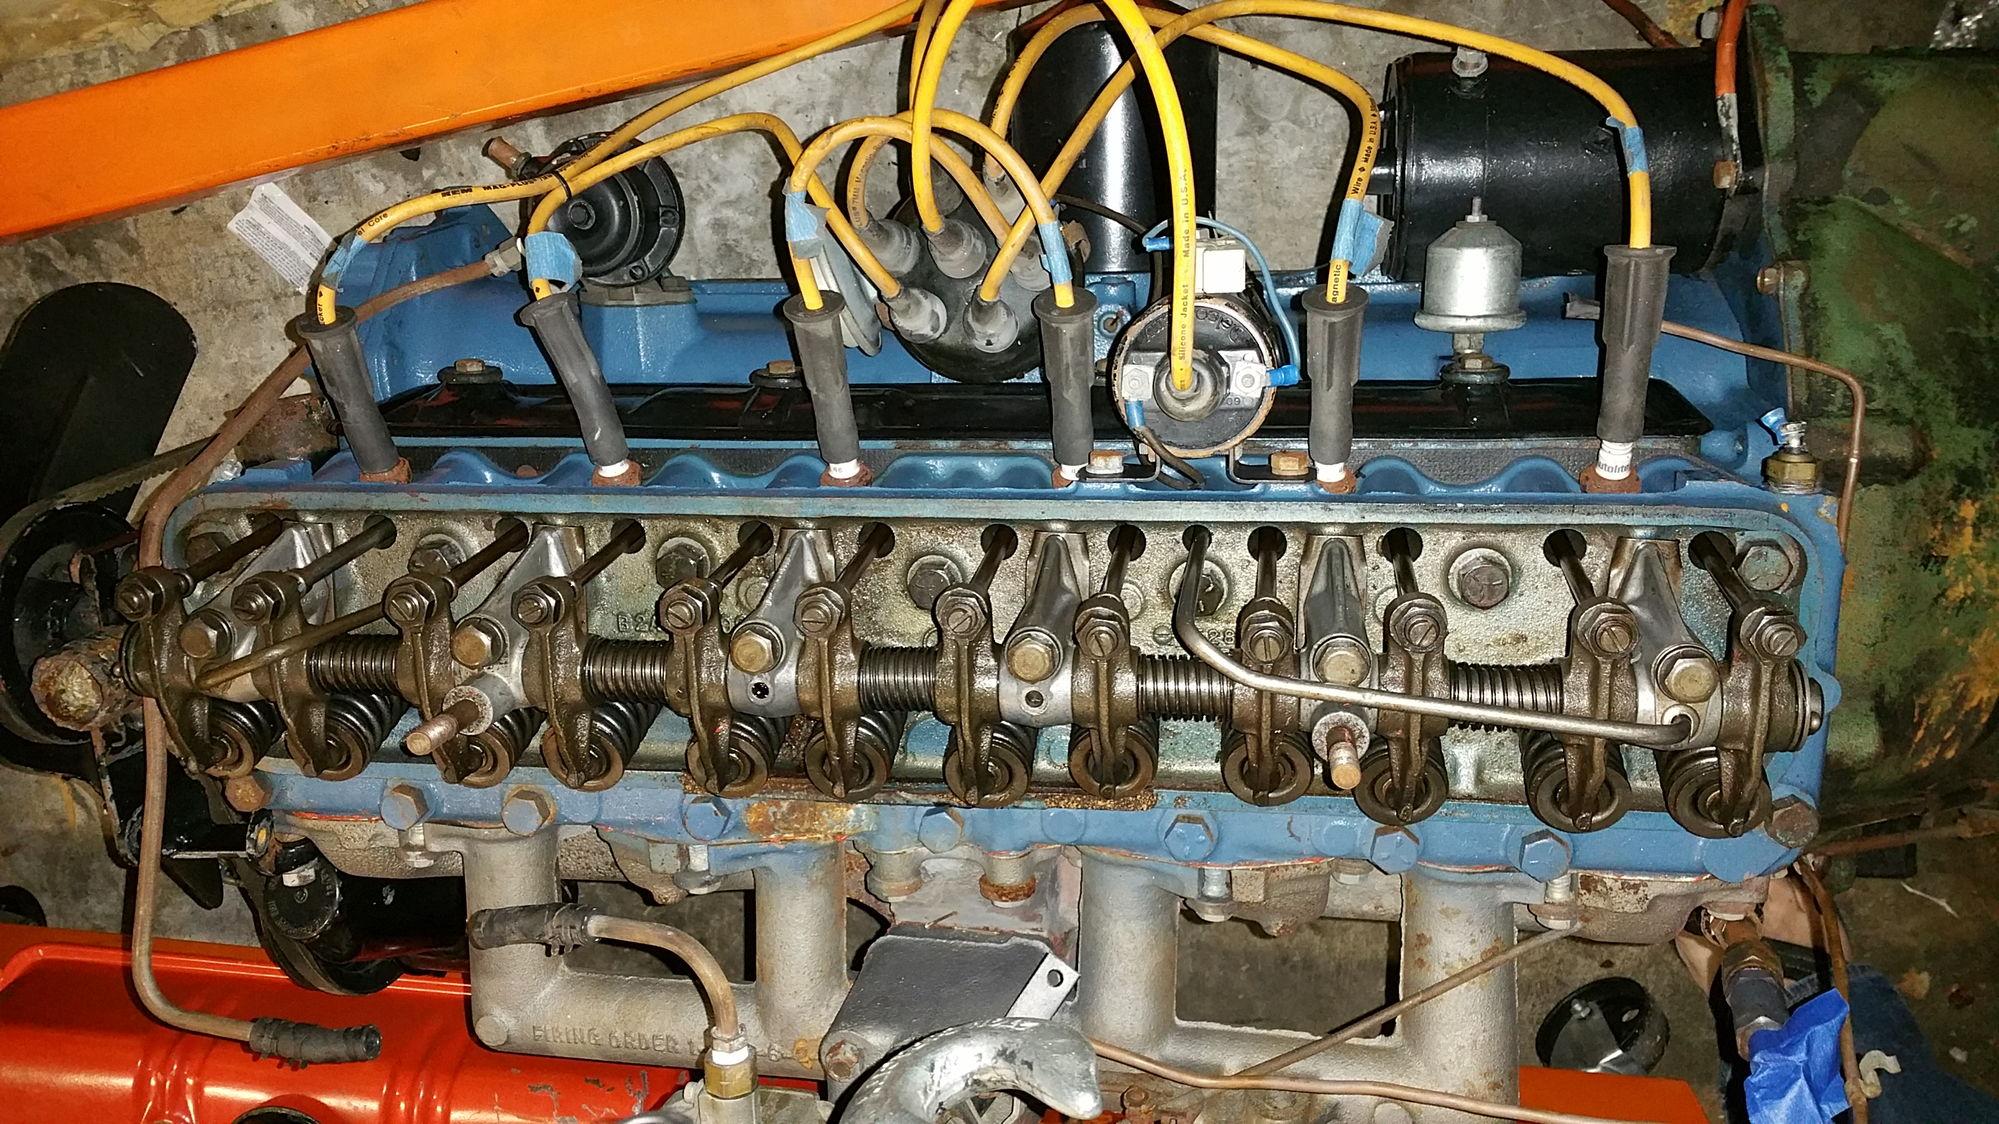 1952 Ford Six Cylinder Engine : Wanted cid ihv cylinder engine page